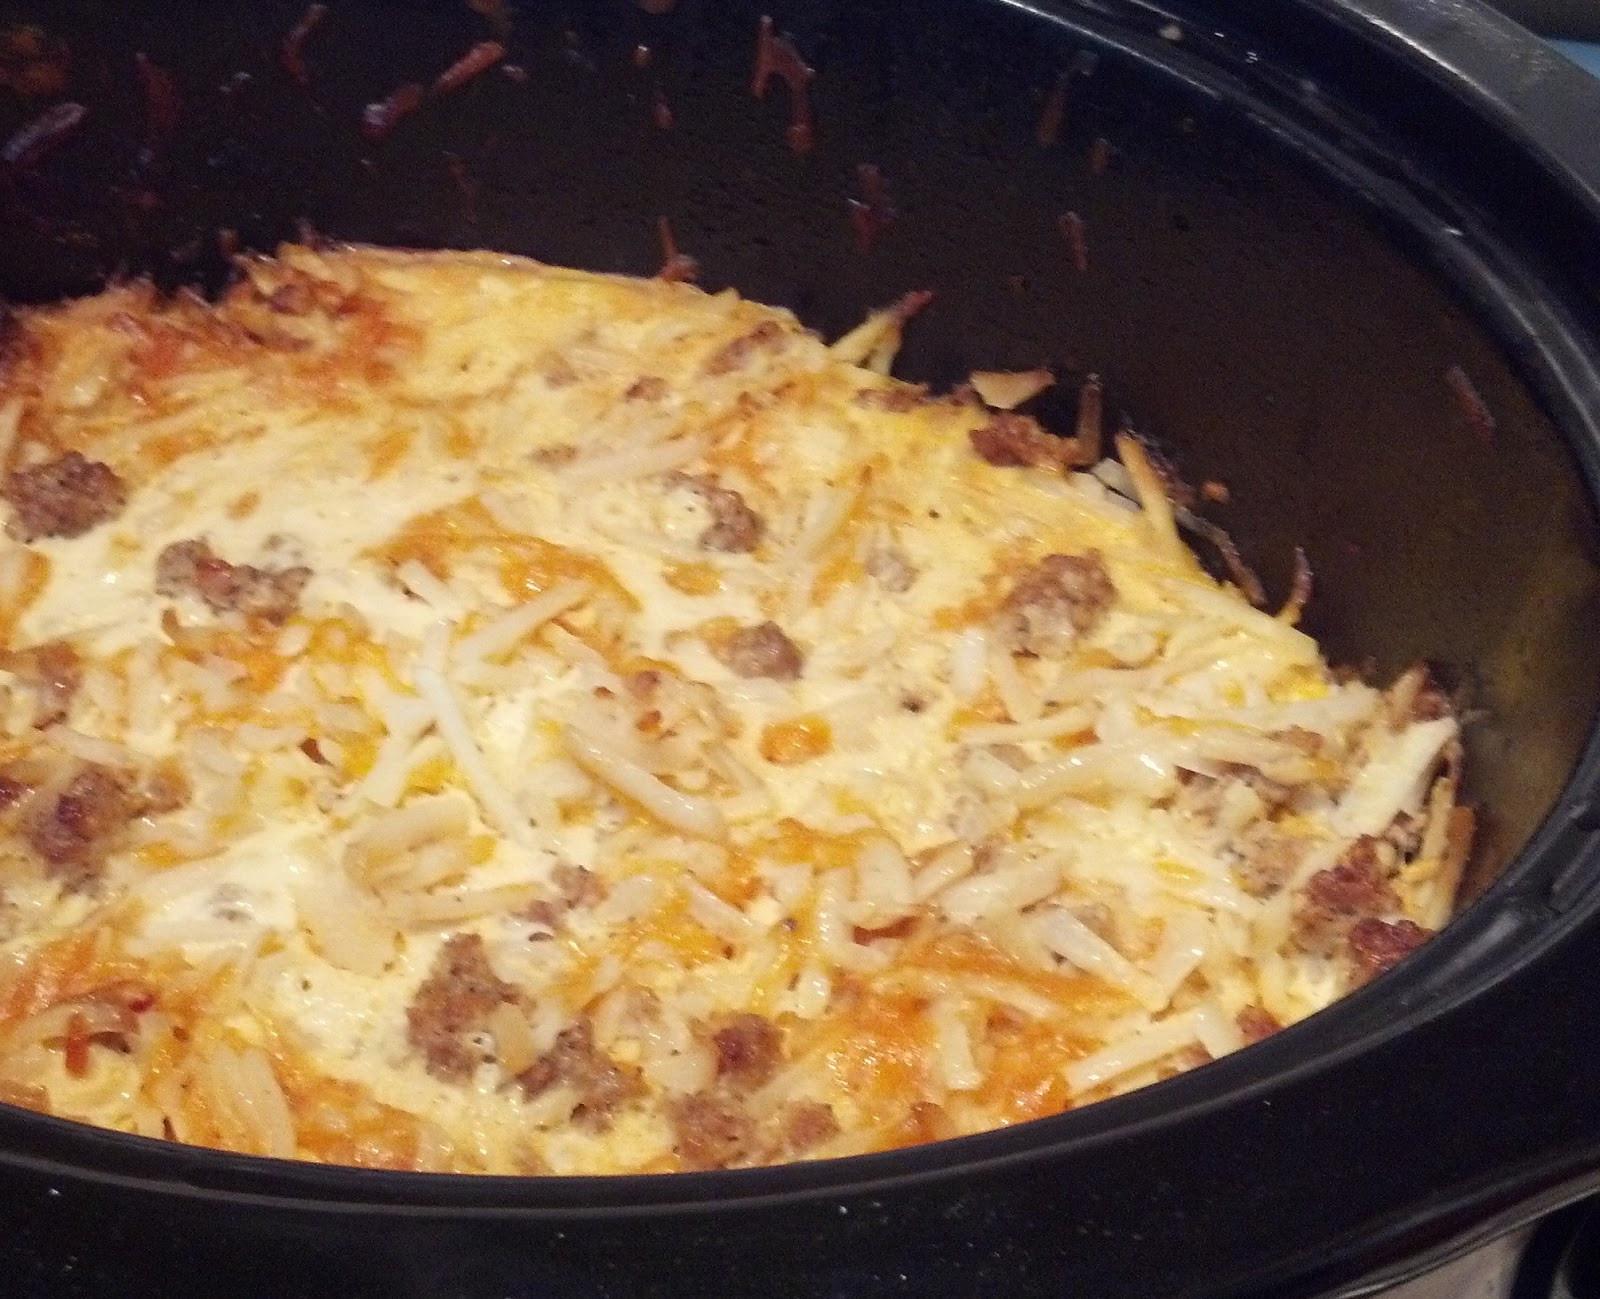 Crock Pot Breakfast Casseroles  CREATIVE TRAVEL MUGS BLOG Crock Pot Breakfast Casserole